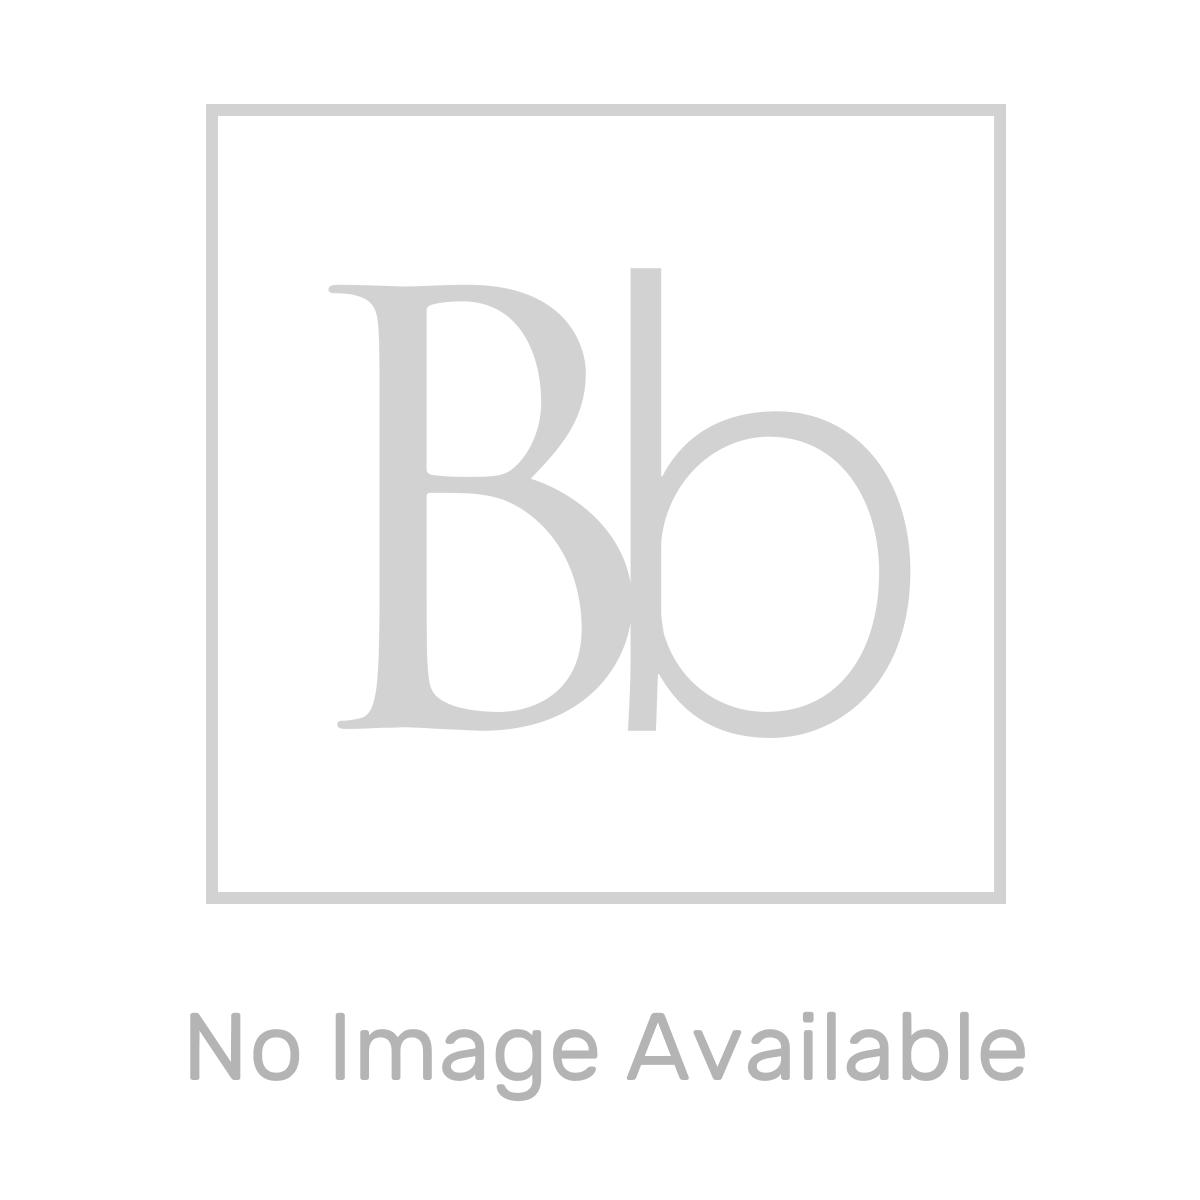 Elation Combination P Shape Indigo Matt Furniture Pack 1010mm Dimensions